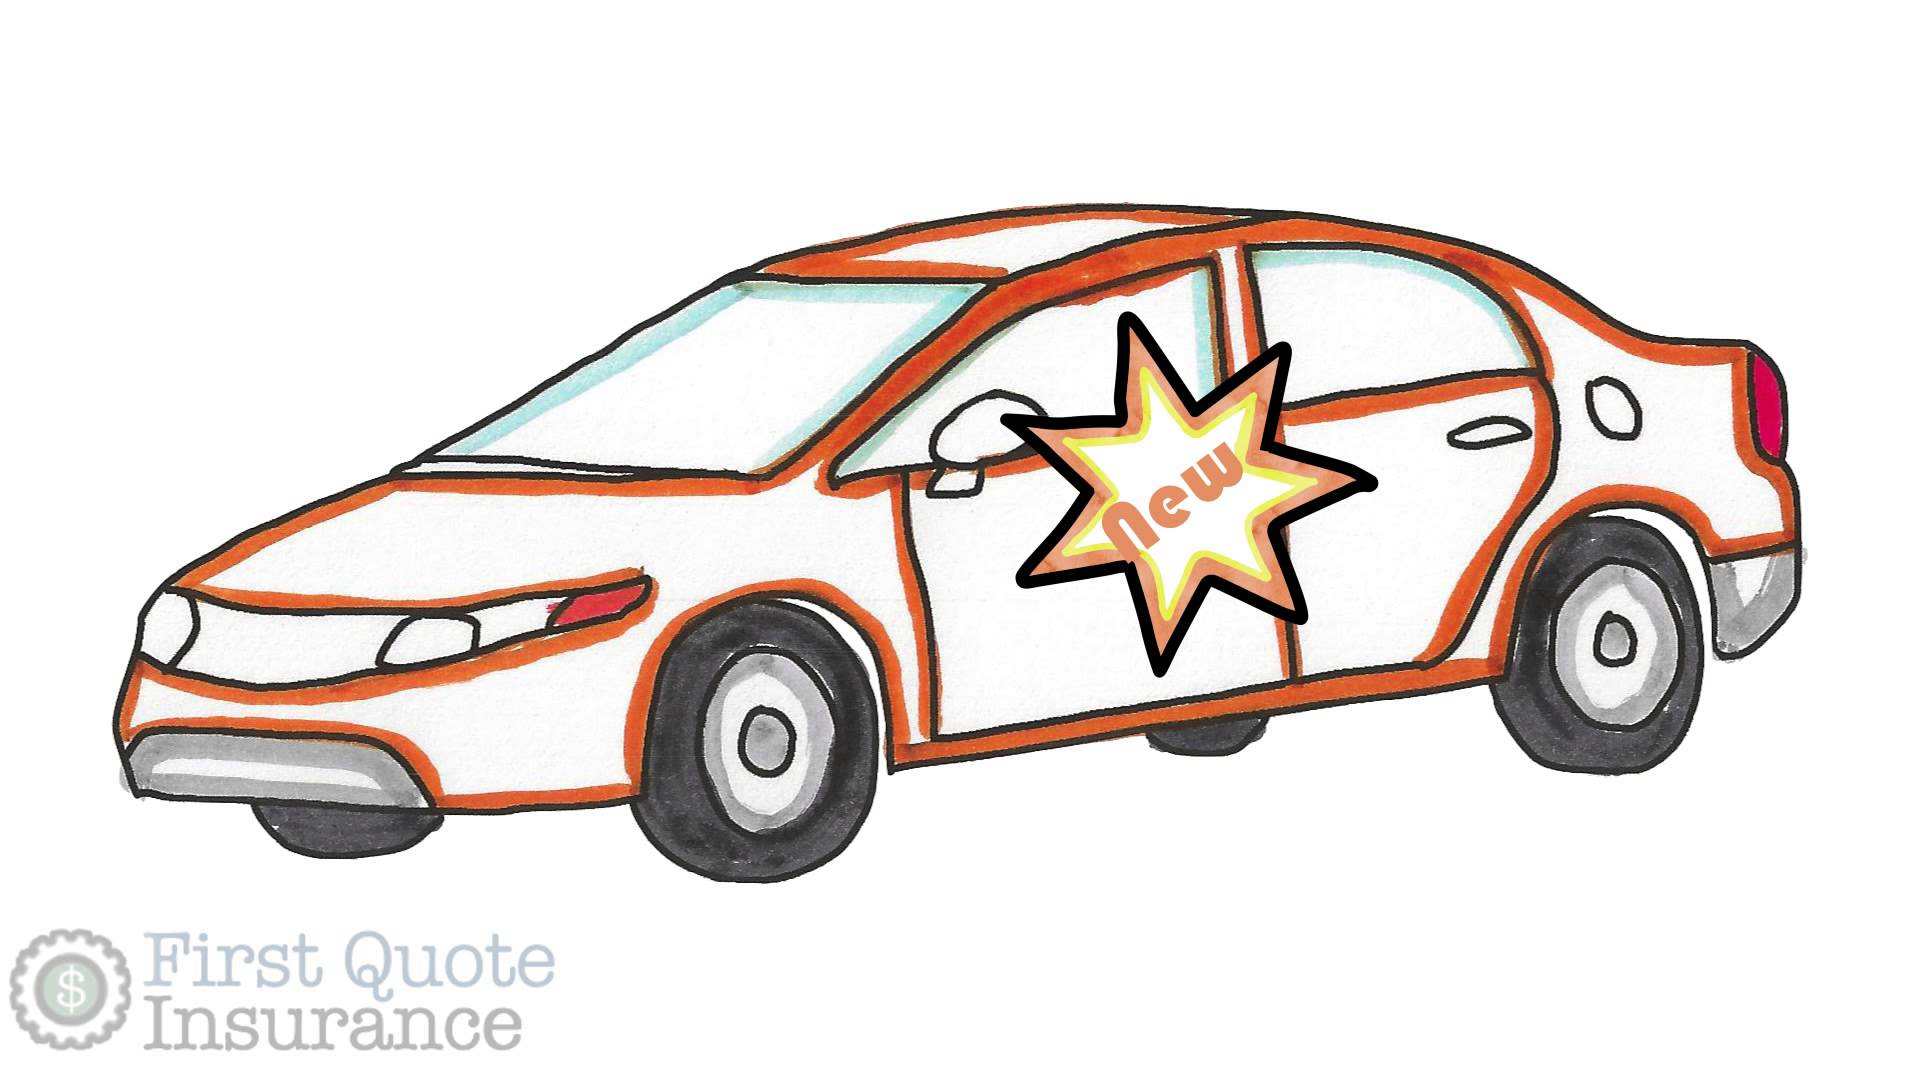 Cheap Car Hire In San Francisco Automobilcars